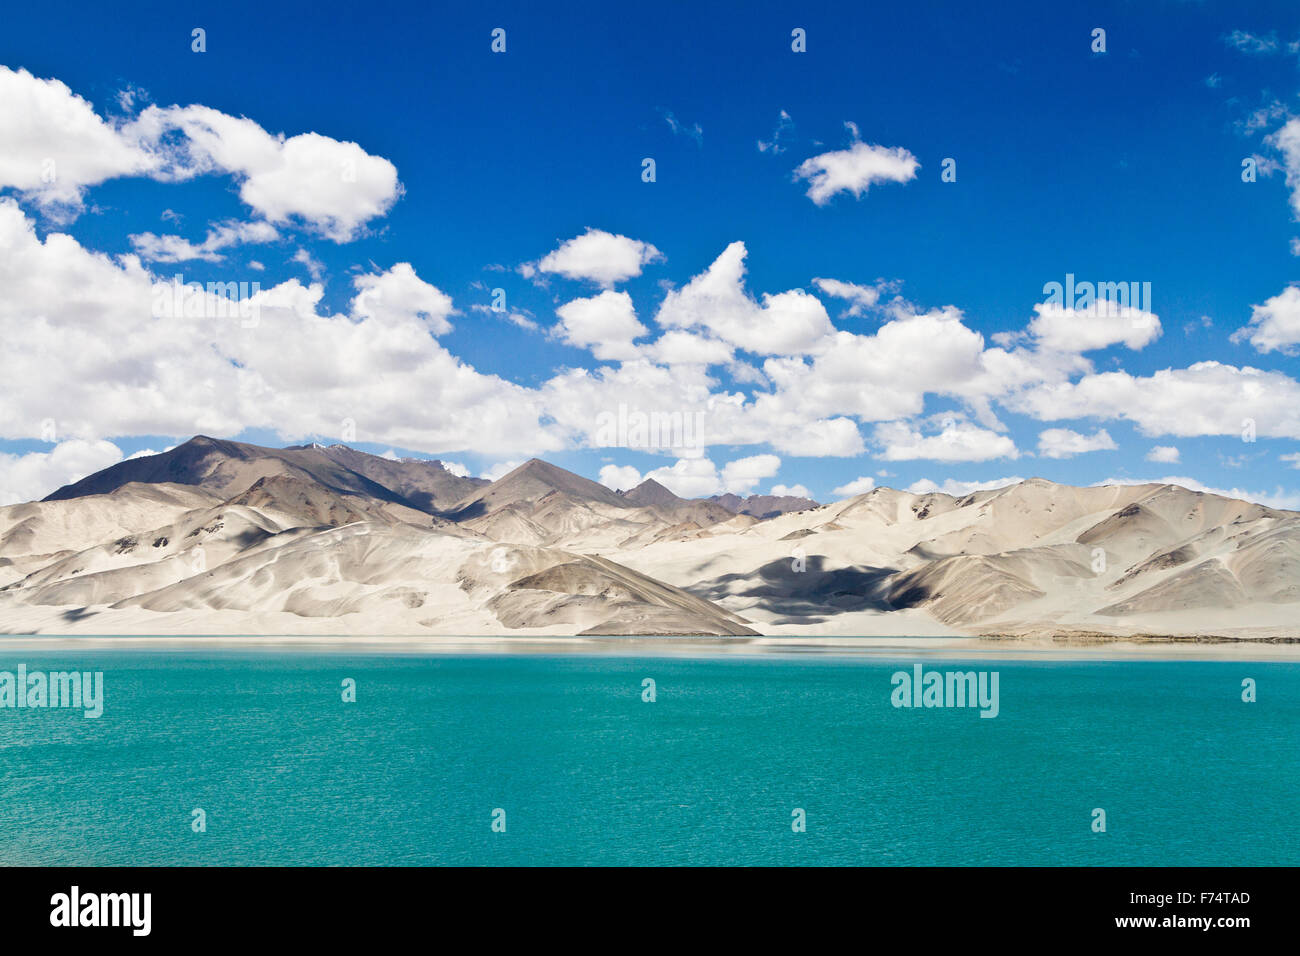 This lake is located along the phenomenal Karakoram highway crossing the Karakoram ranges. - Stock Image